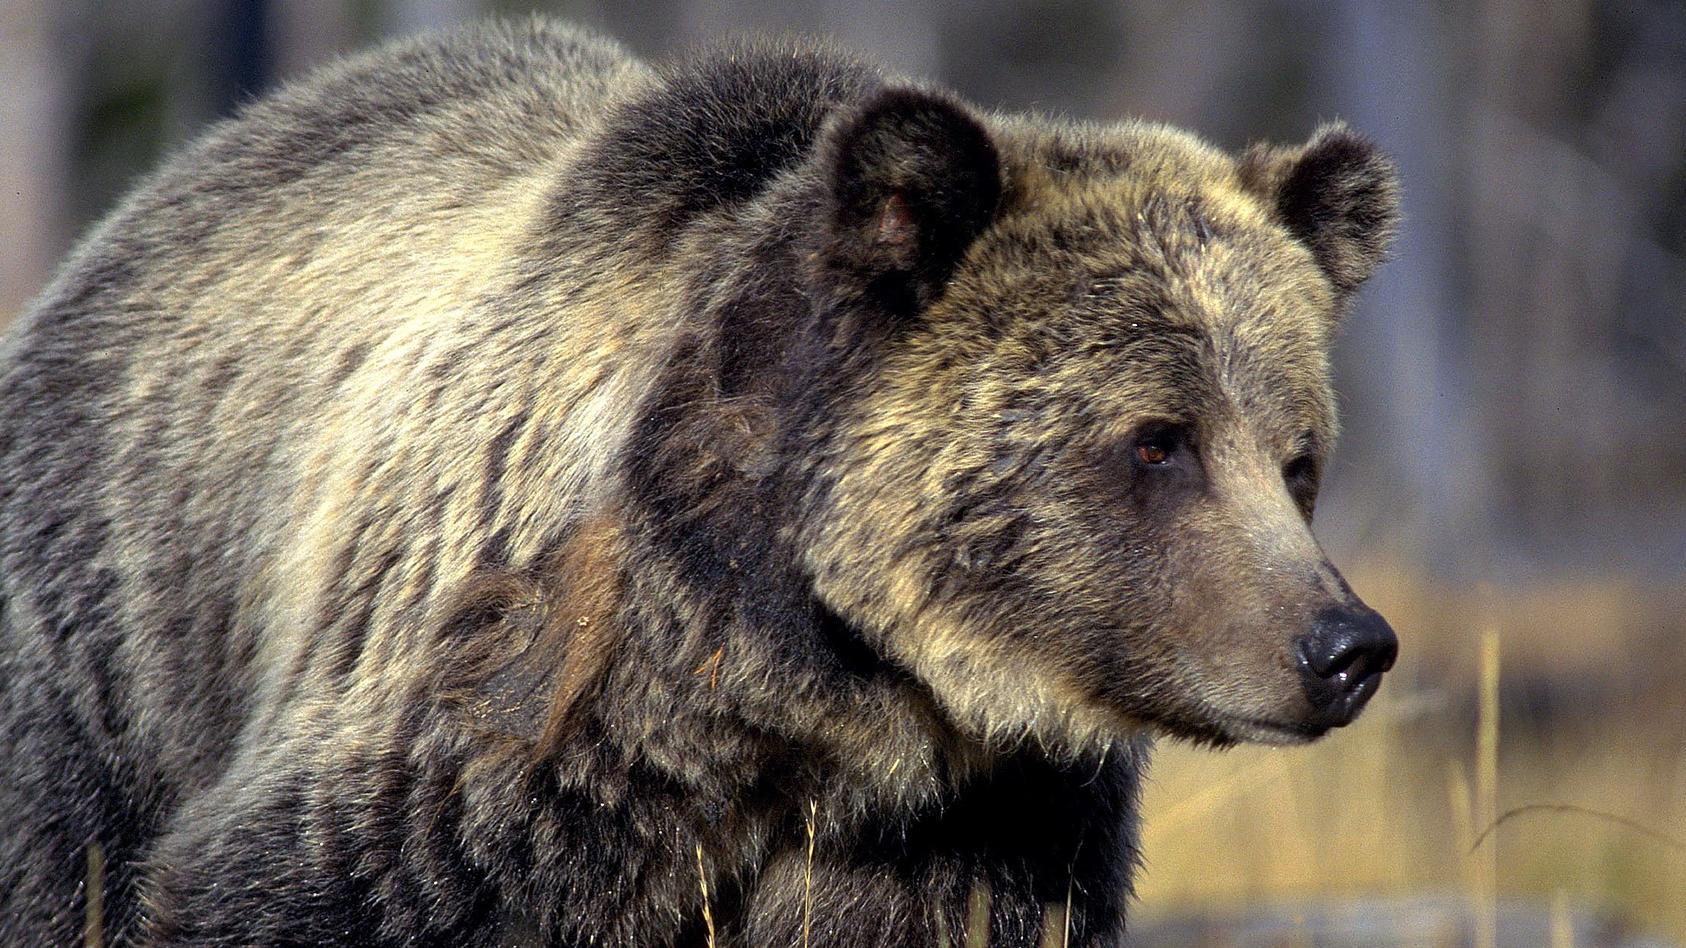 Archivbild: Braunbär - Grizzlybär